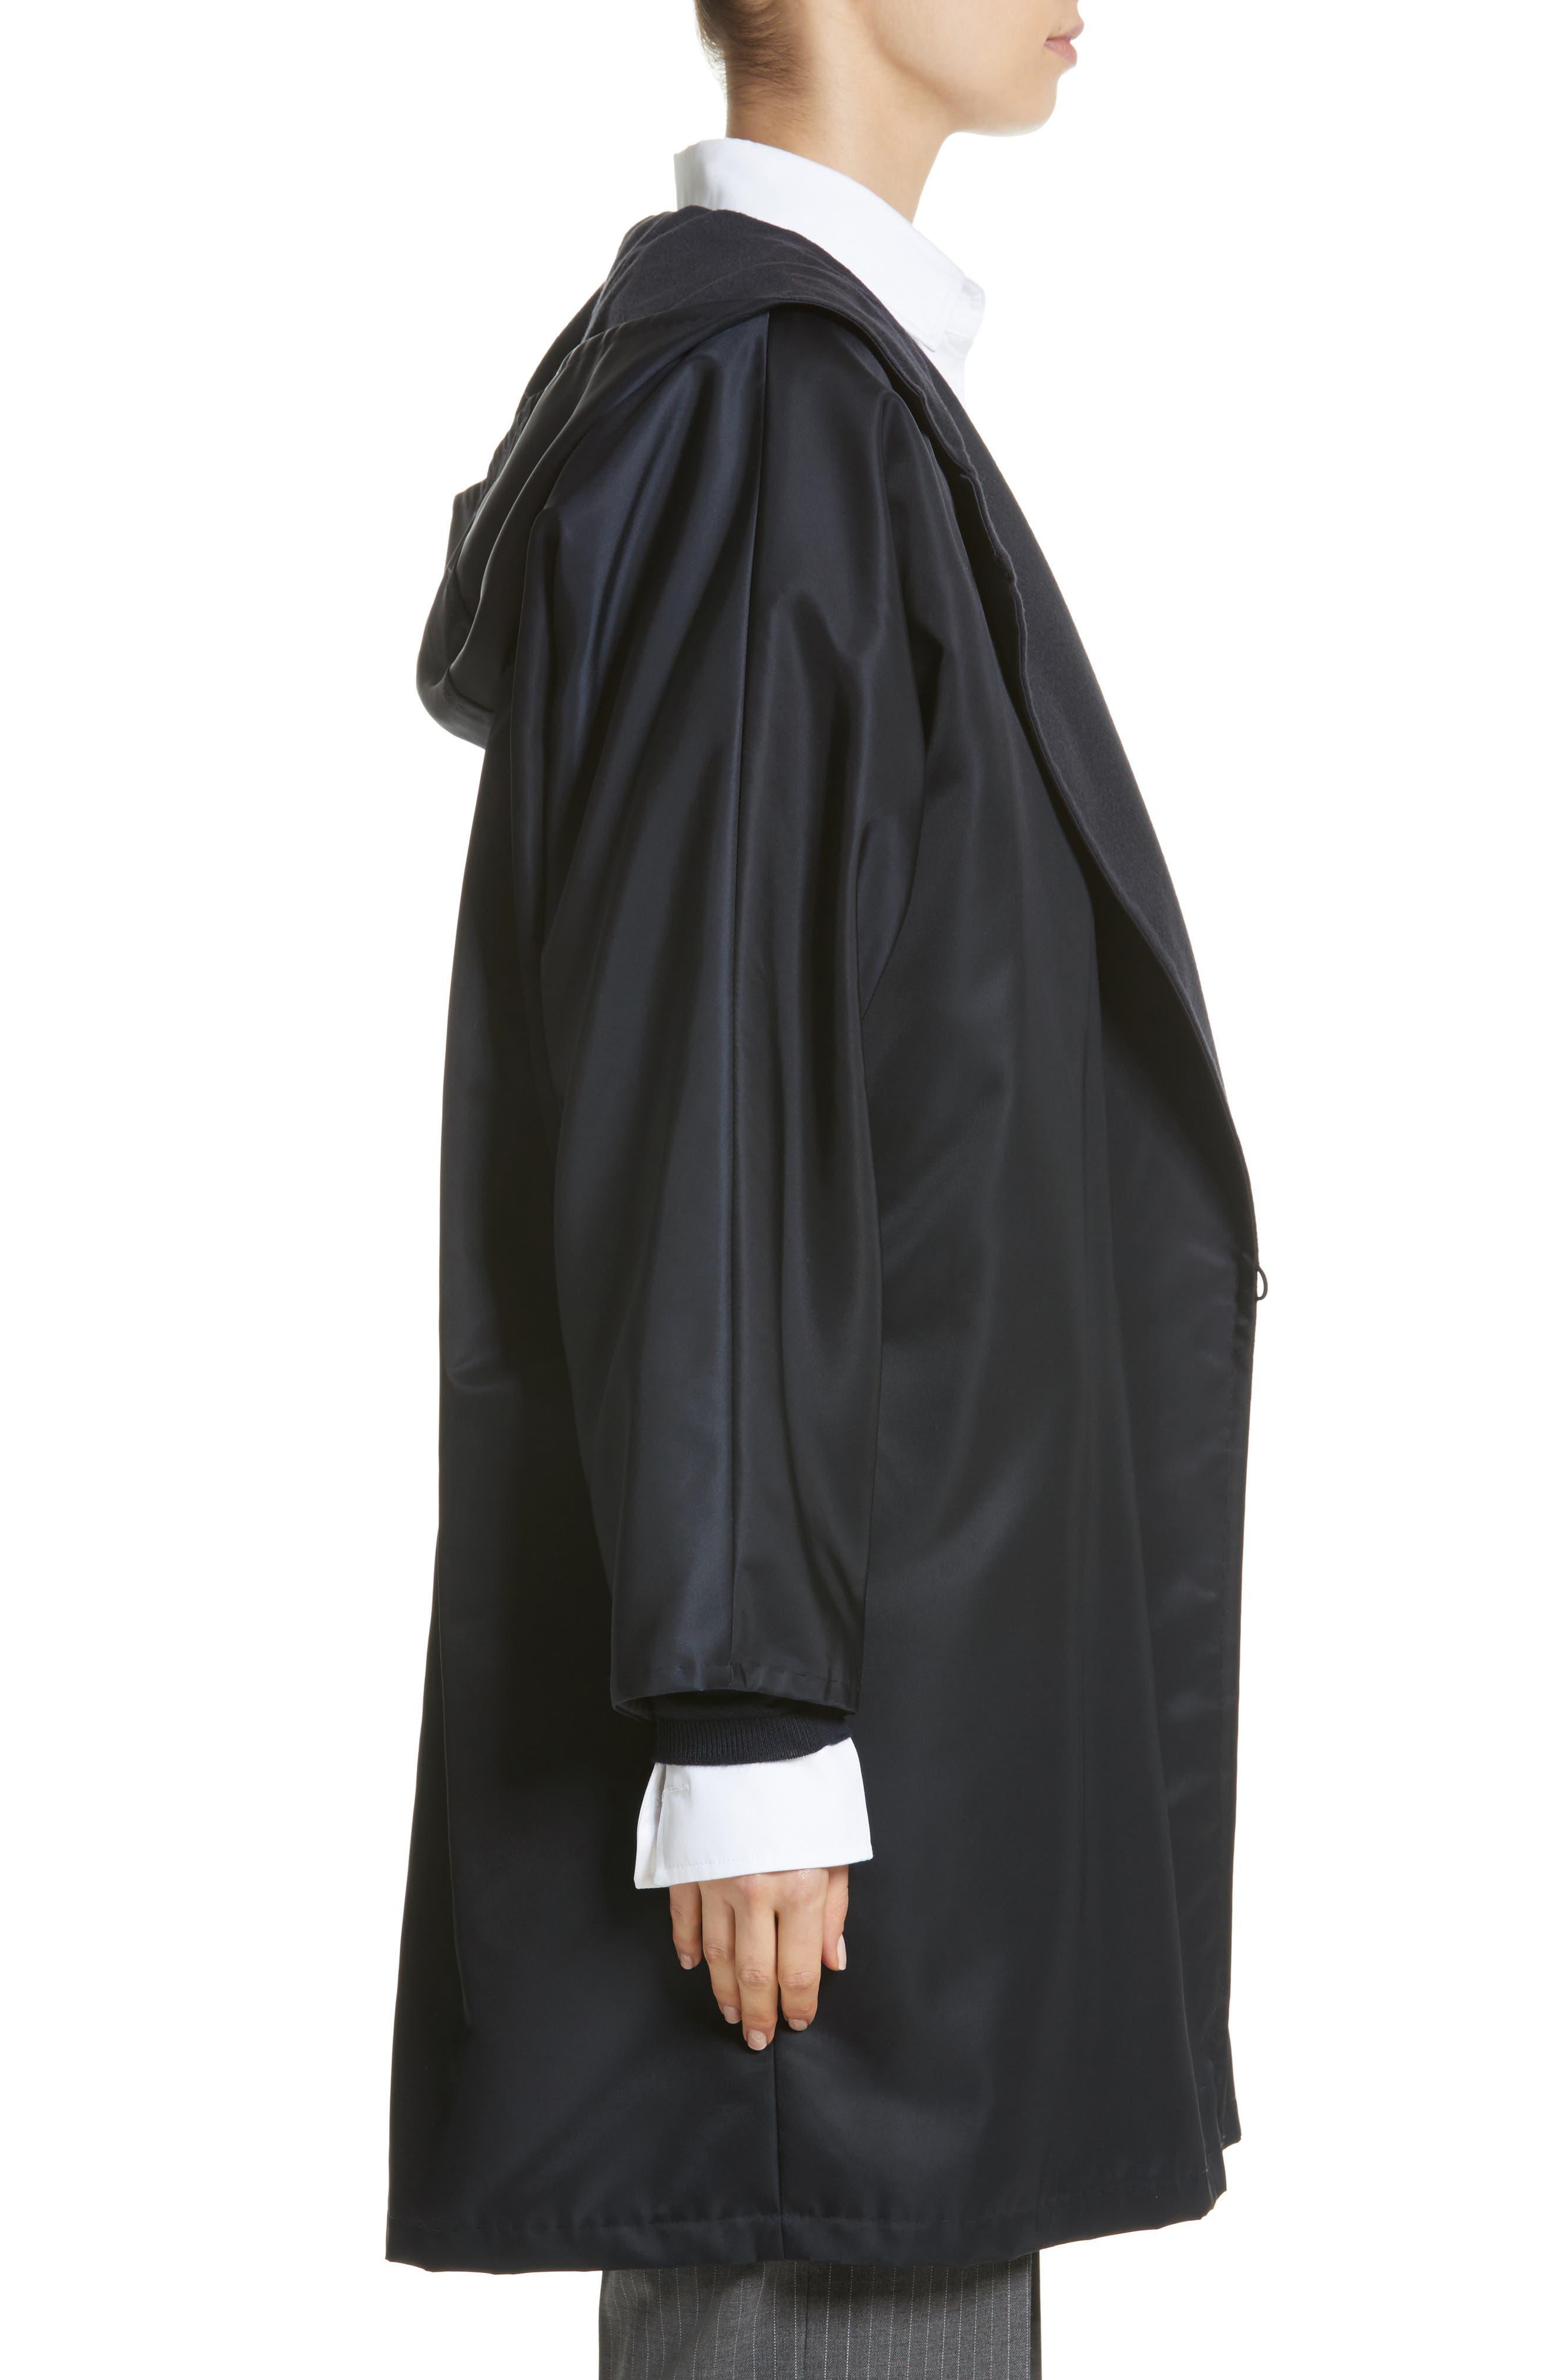 Jacopo Reversible Hooded Coat,                             Alternate thumbnail 4, color,